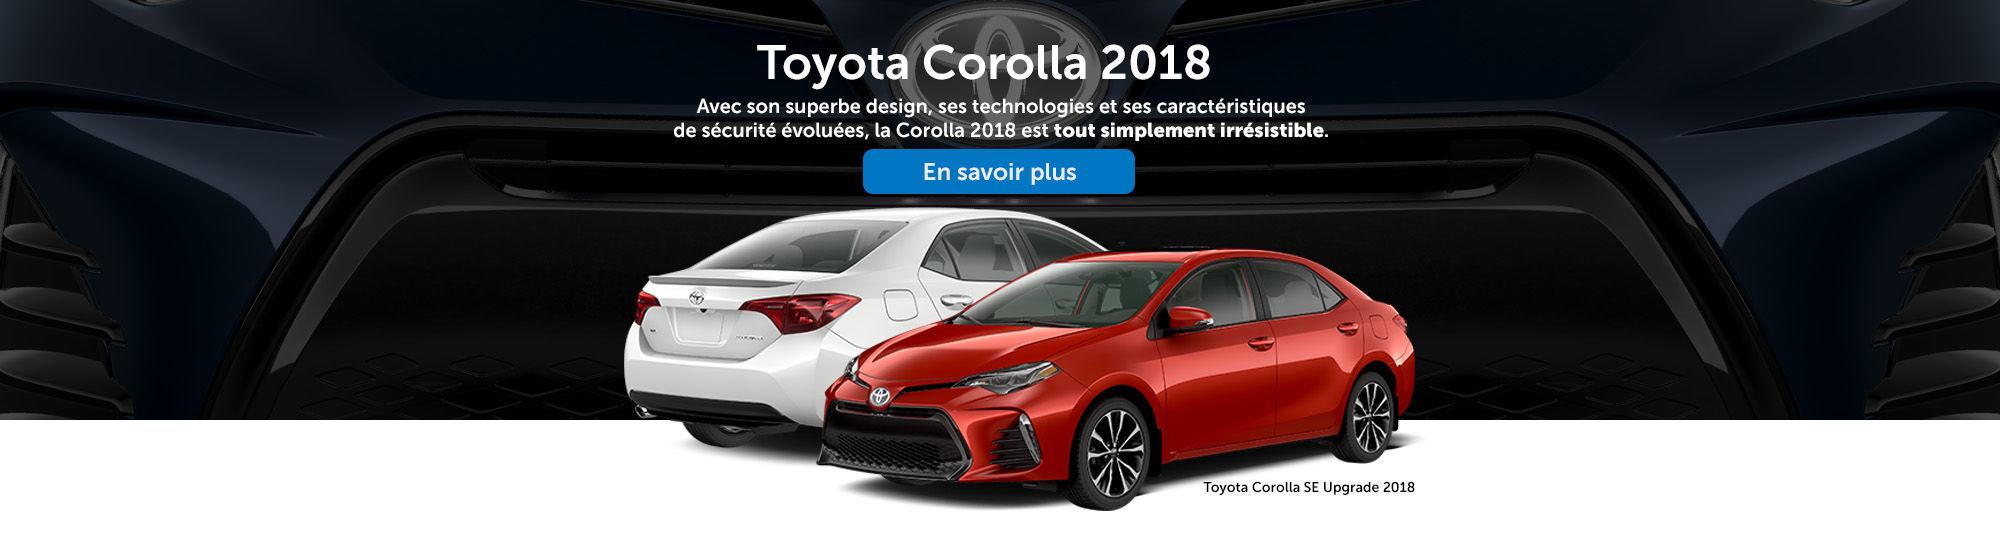 Toyota Corolla 2018 simplement irrésistible